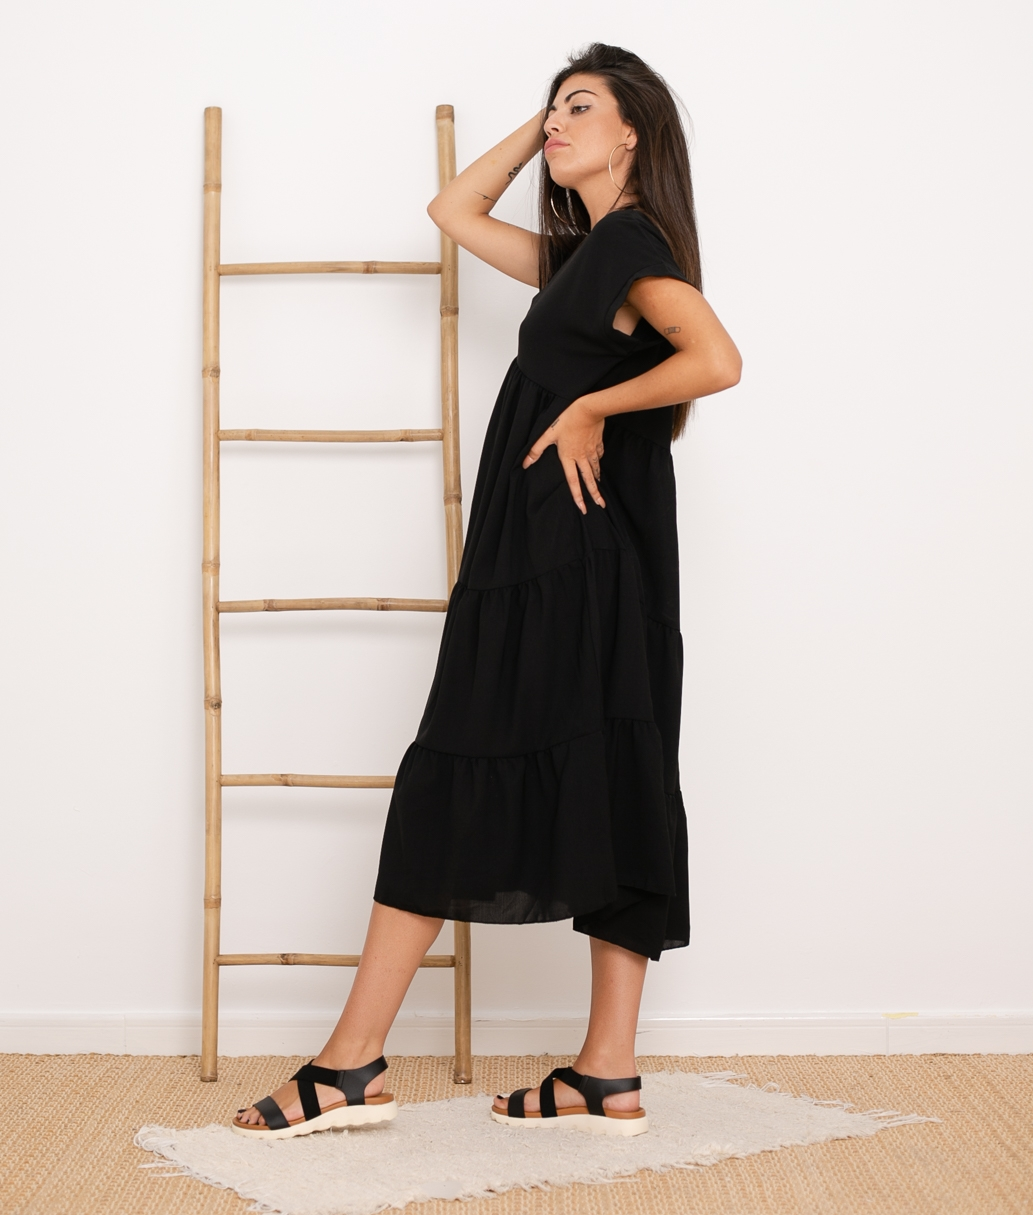 Vestido Criker - Black